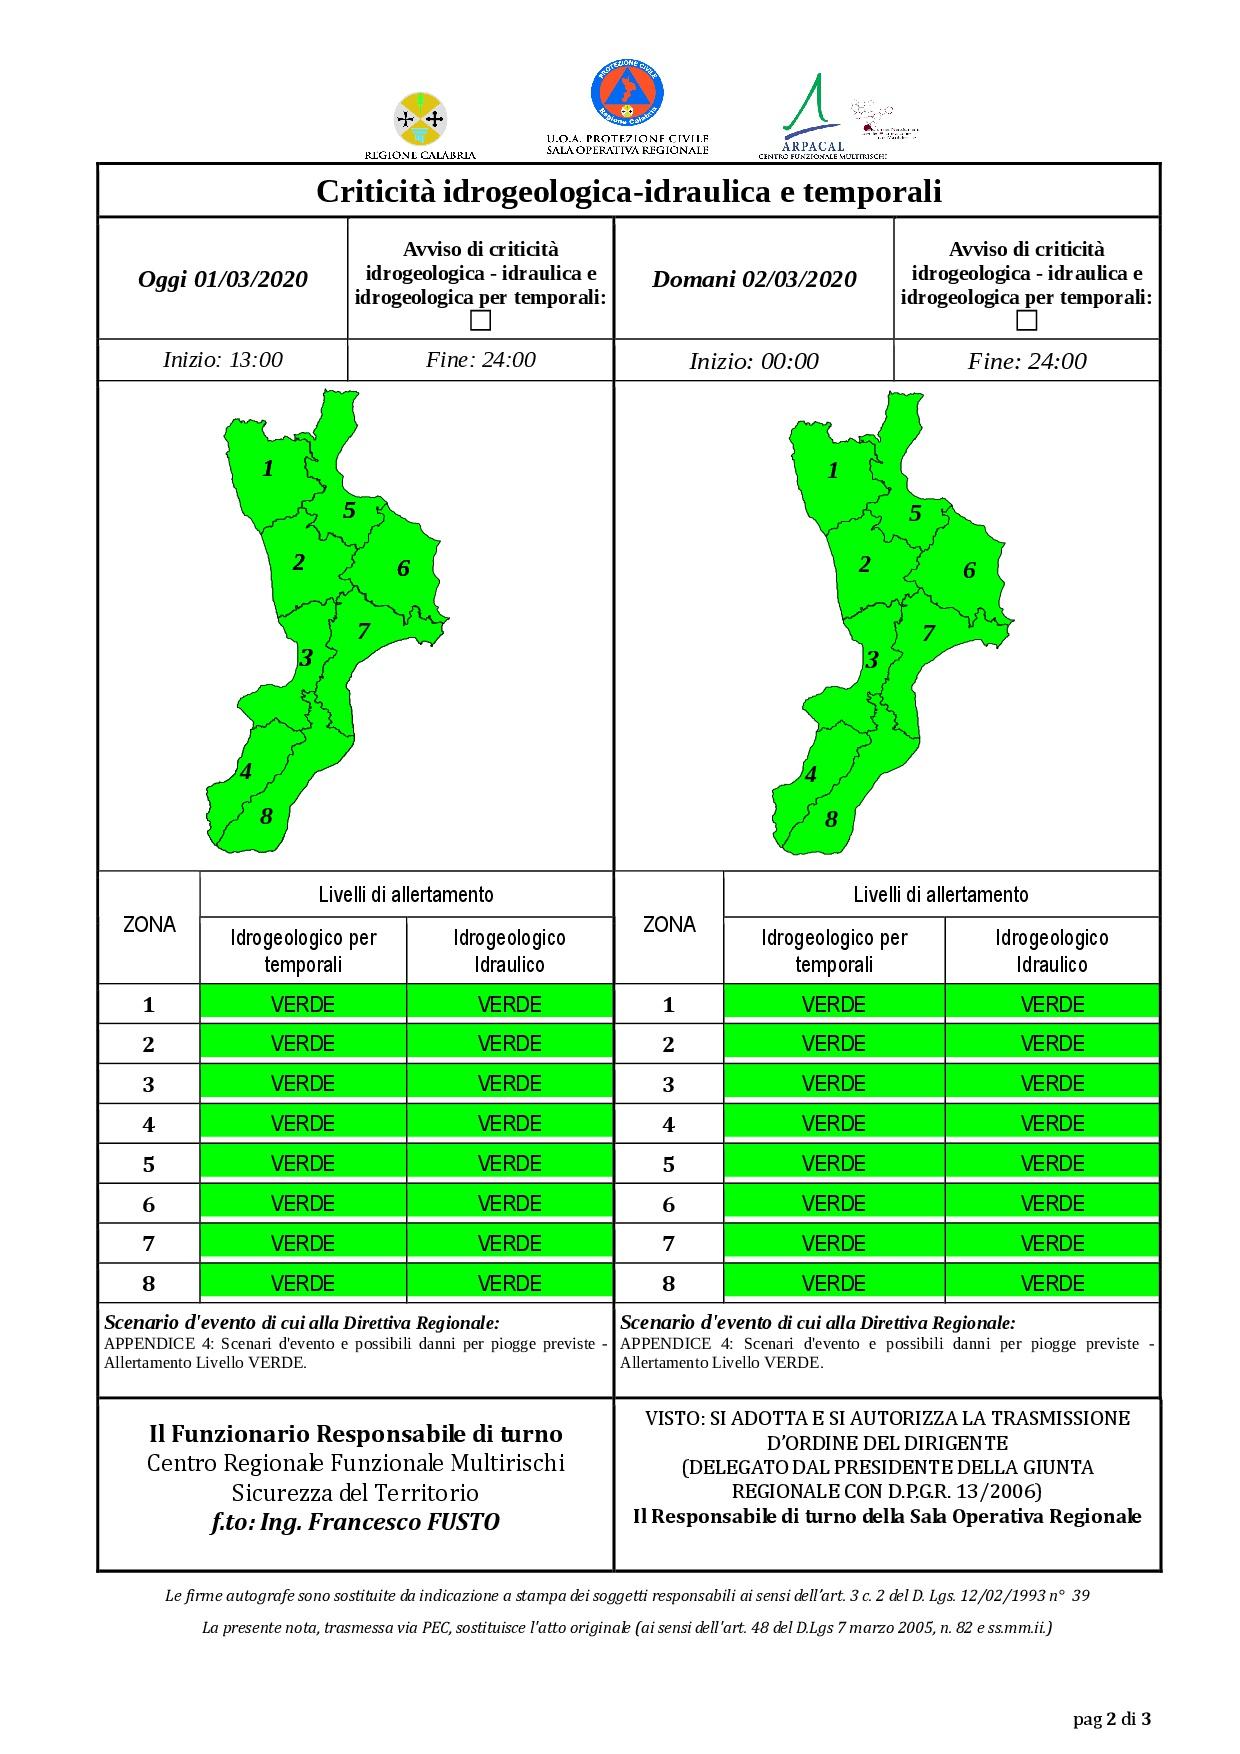 Criticità idrogeologica-idraulica e temporali in Calabria 01-03-2020